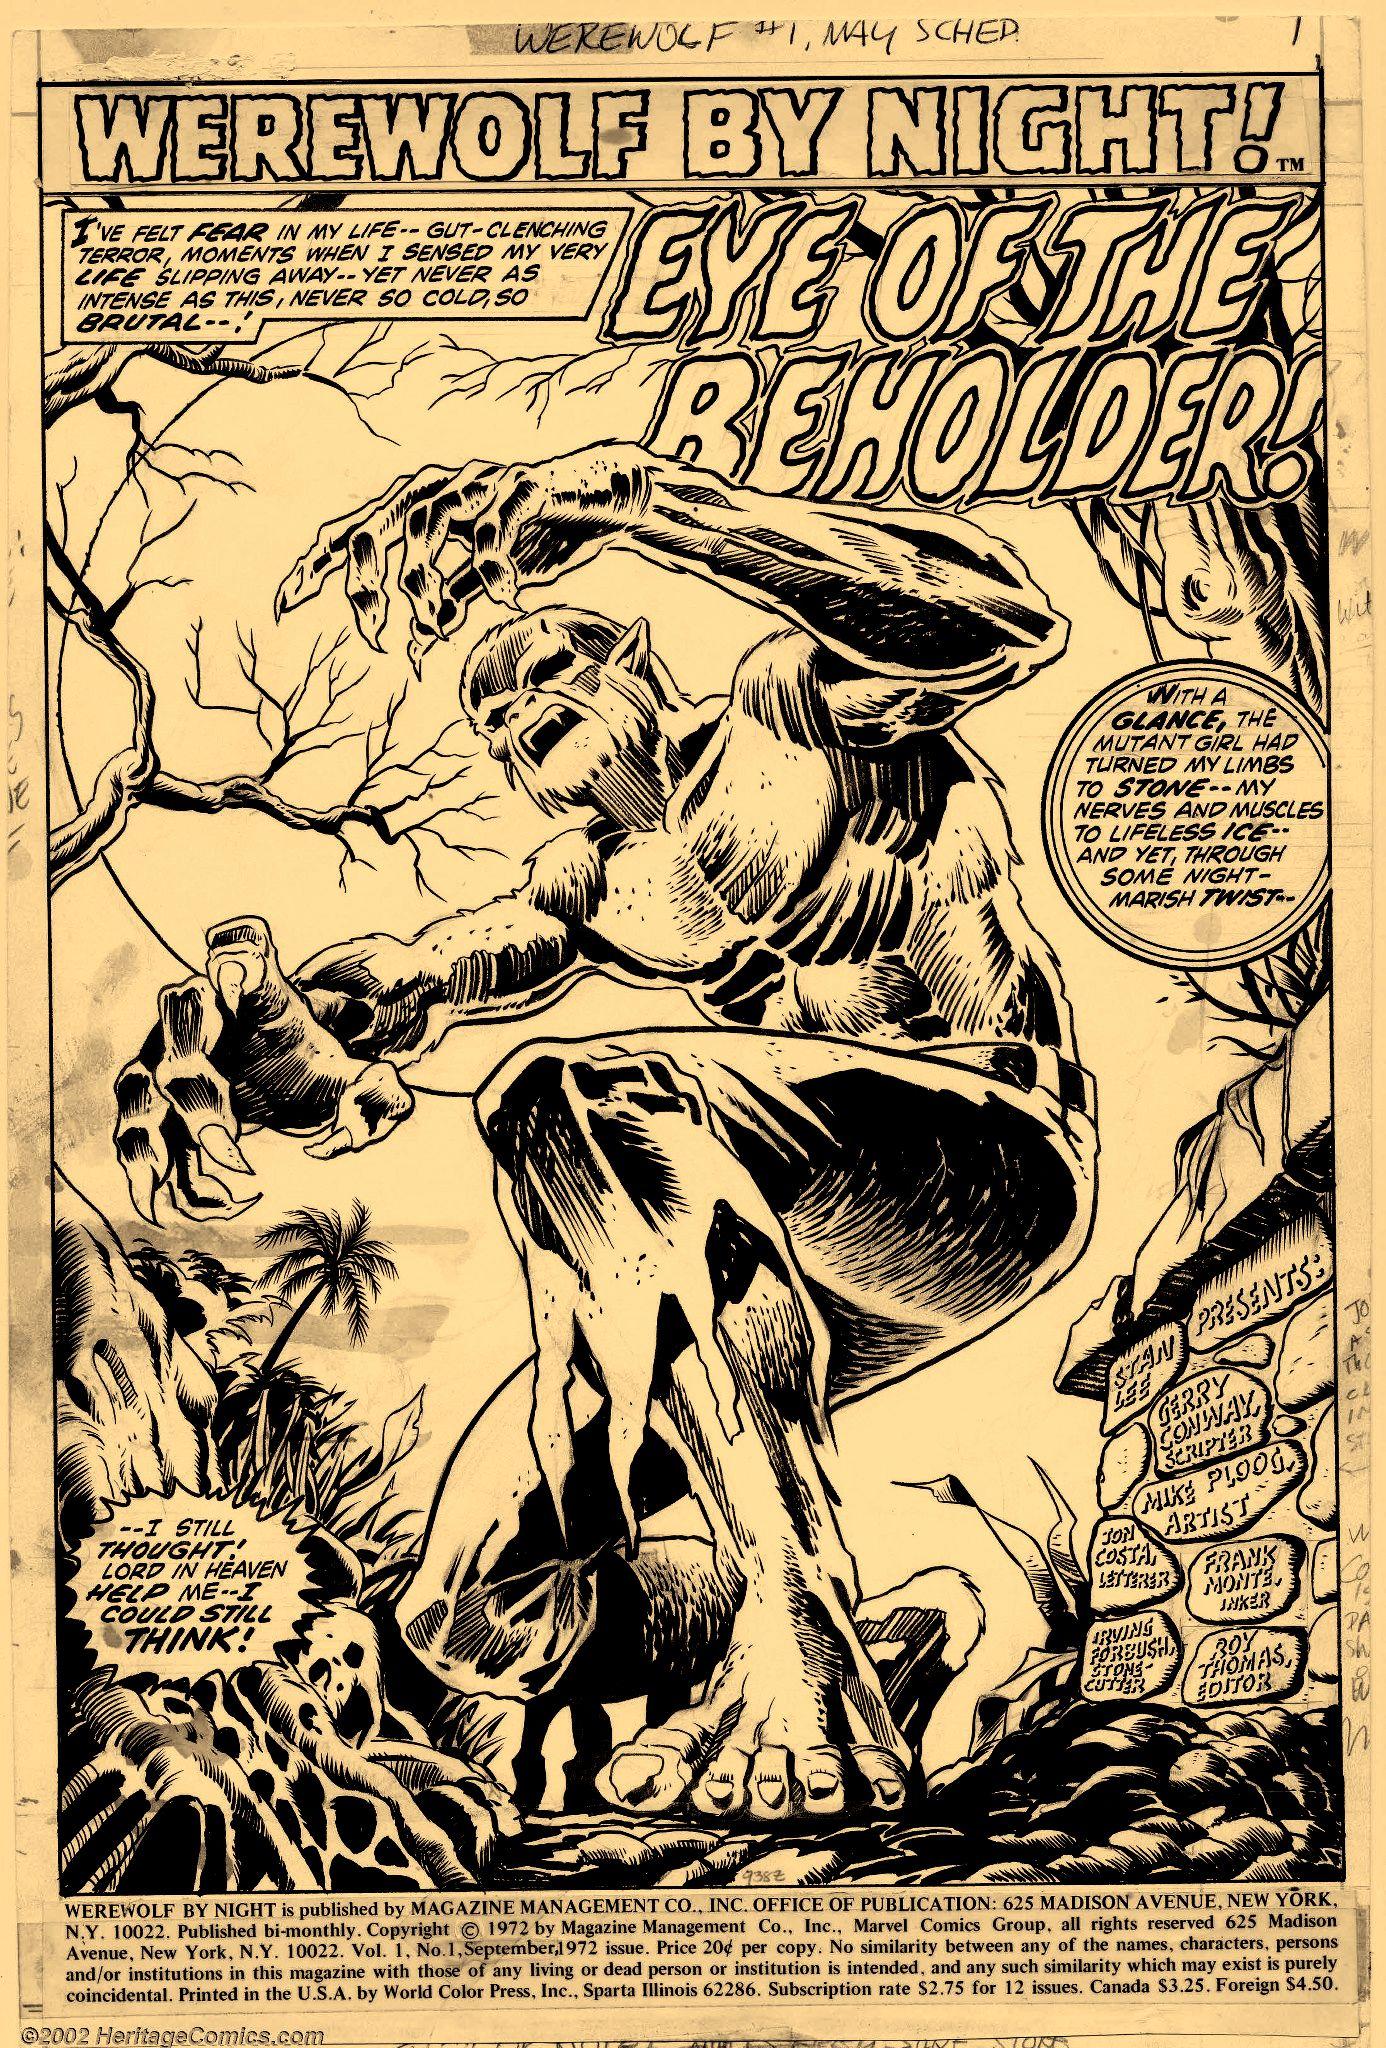 Werewolf By Night #1 Splash Page by Mike Ploog